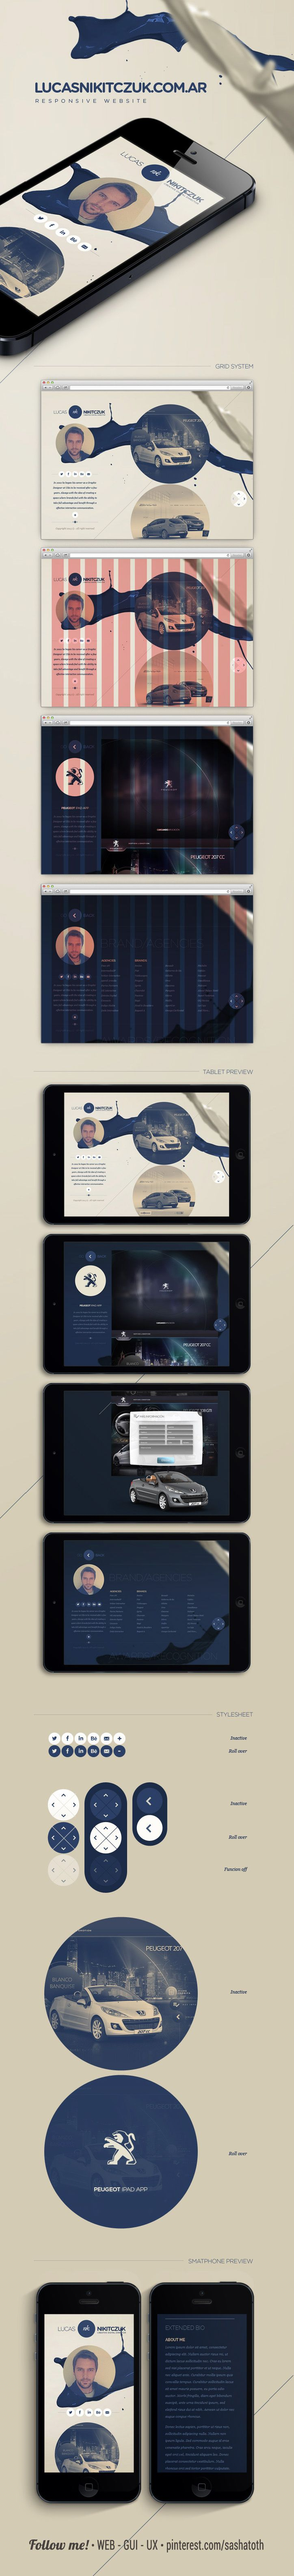 "Lucas Nikitczuk   Responsive Website *** ""This is my personal portfolio made with responsive design."" by Lucas Nikitczuk"